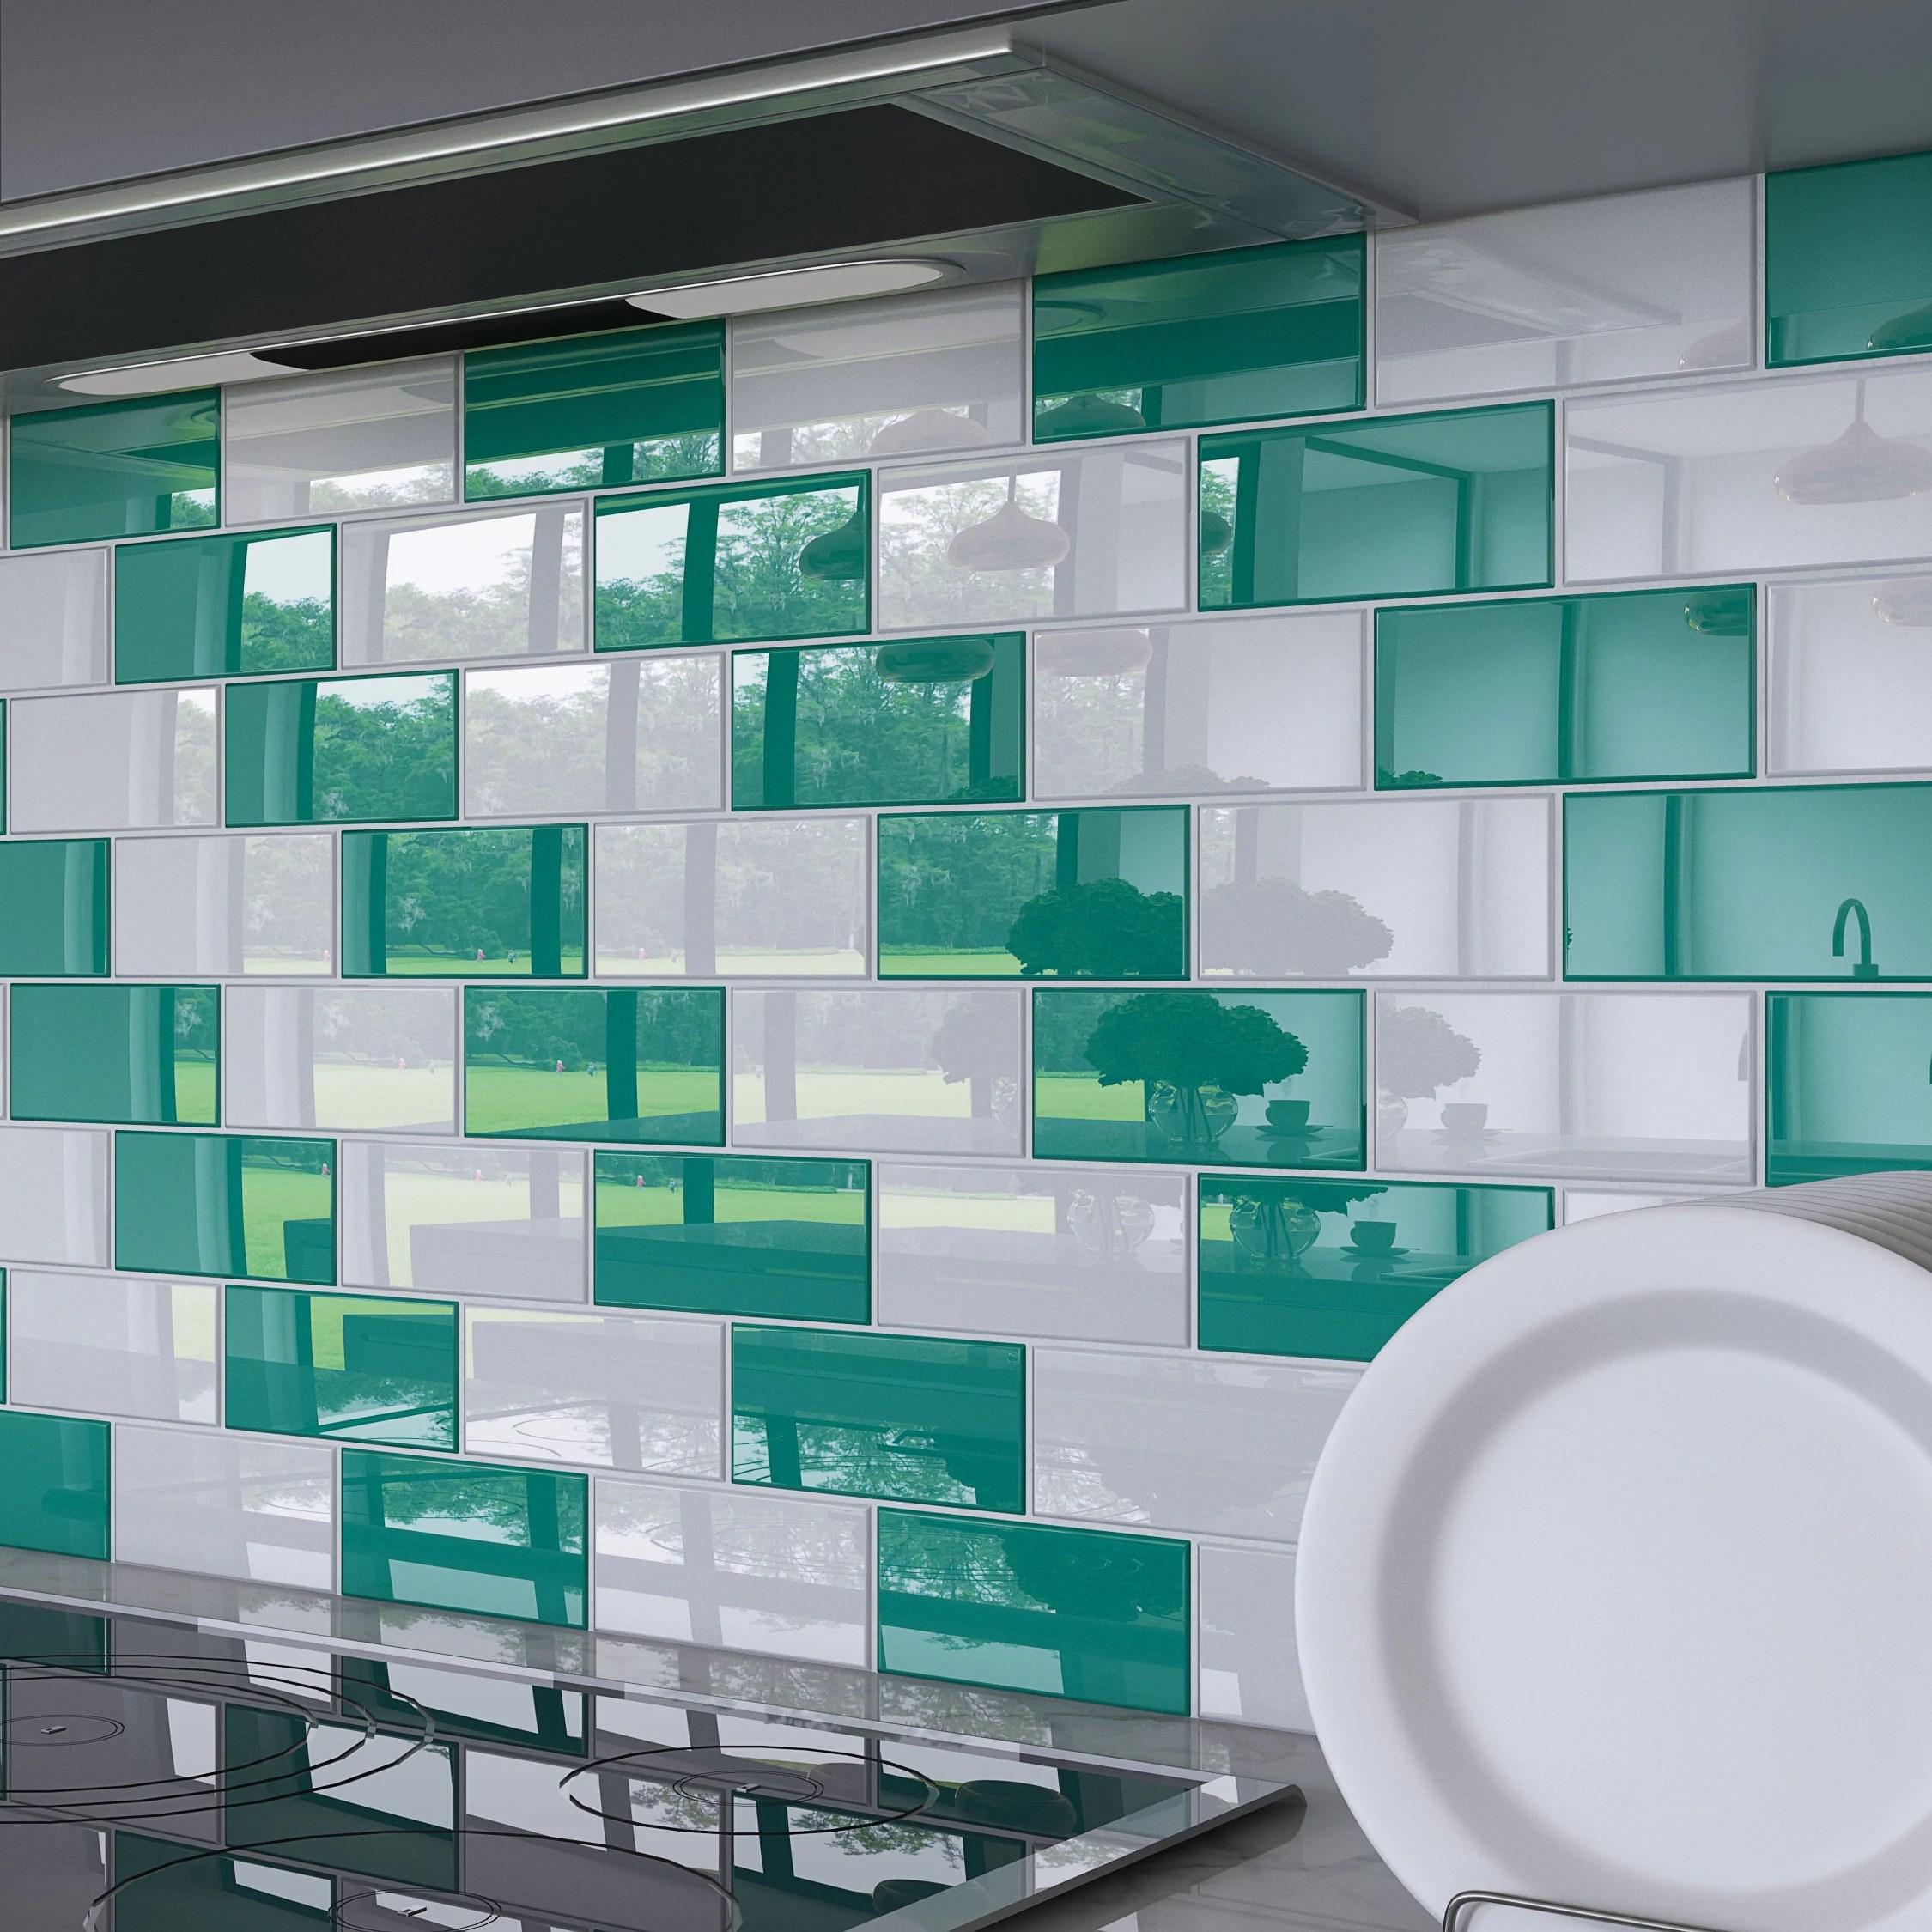 emerald green 3x6 glass subway tile